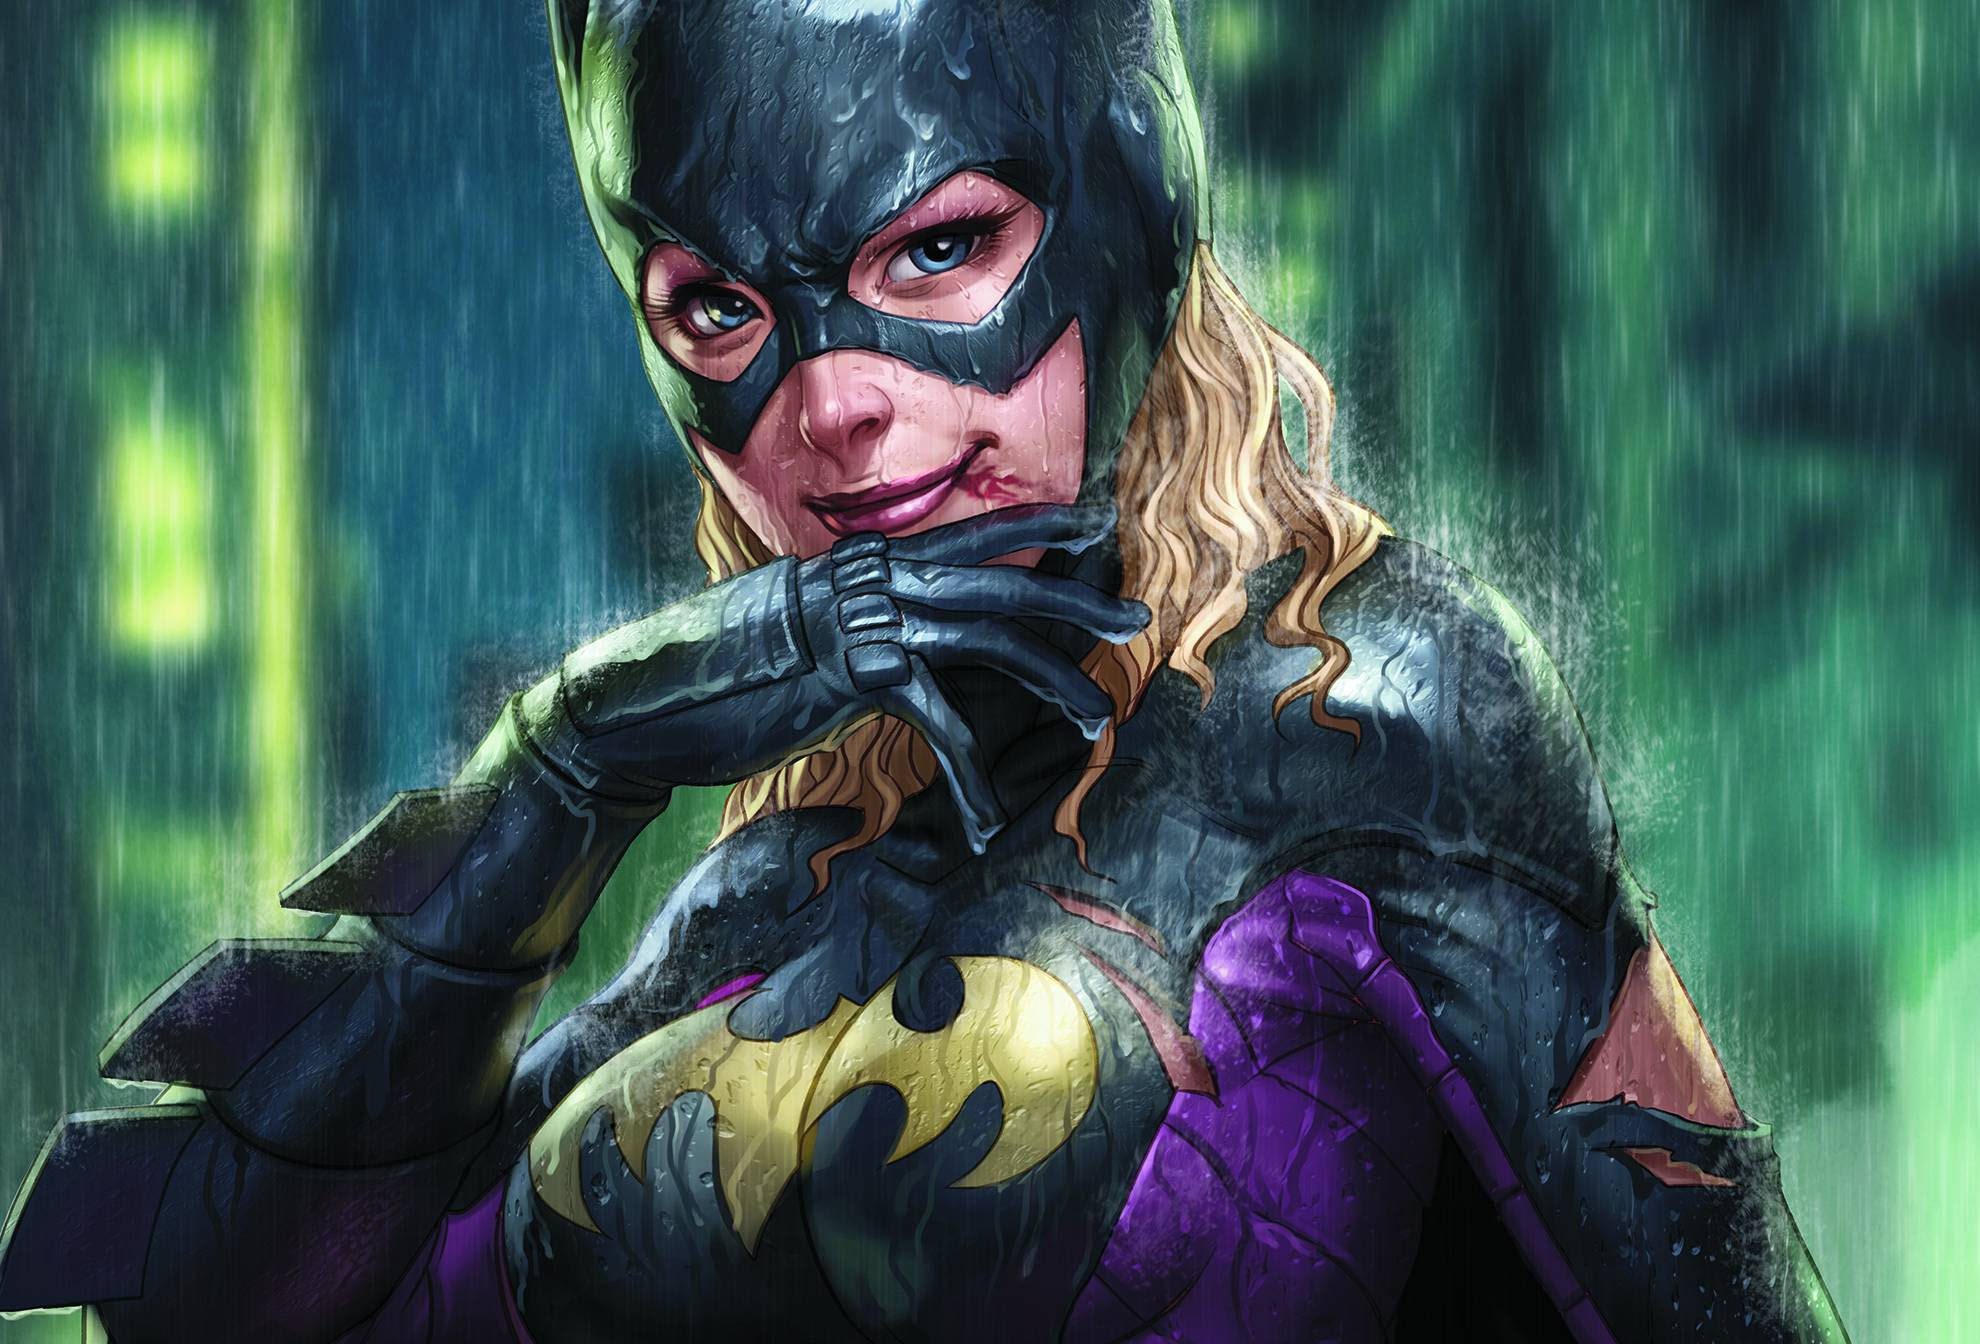 Sexy Superhero Wallpaper (73+ images)